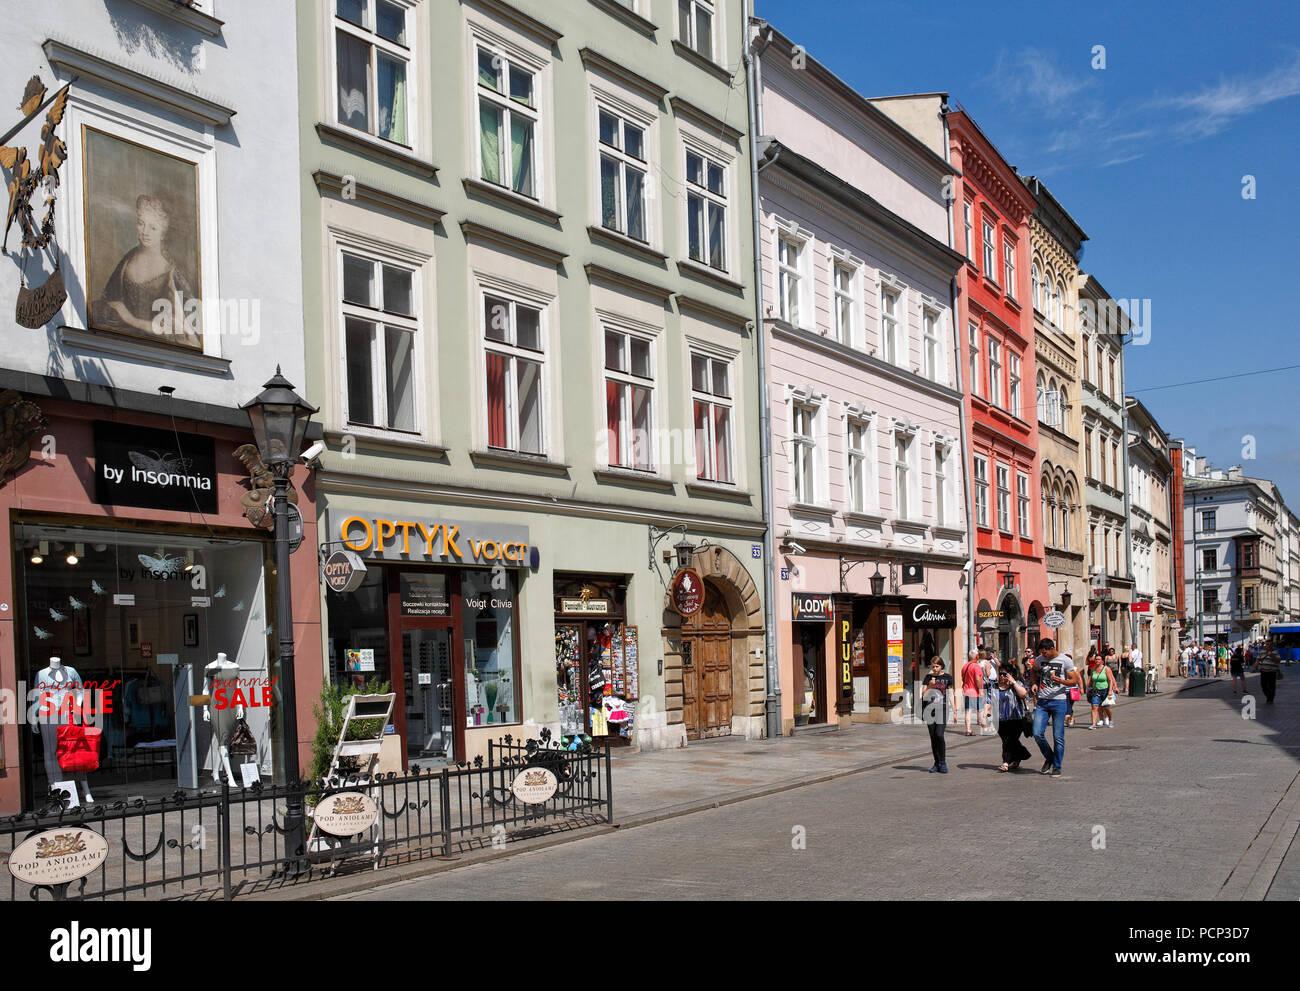 people in old town krakow, lesser poland, poland, europe Stock Photo